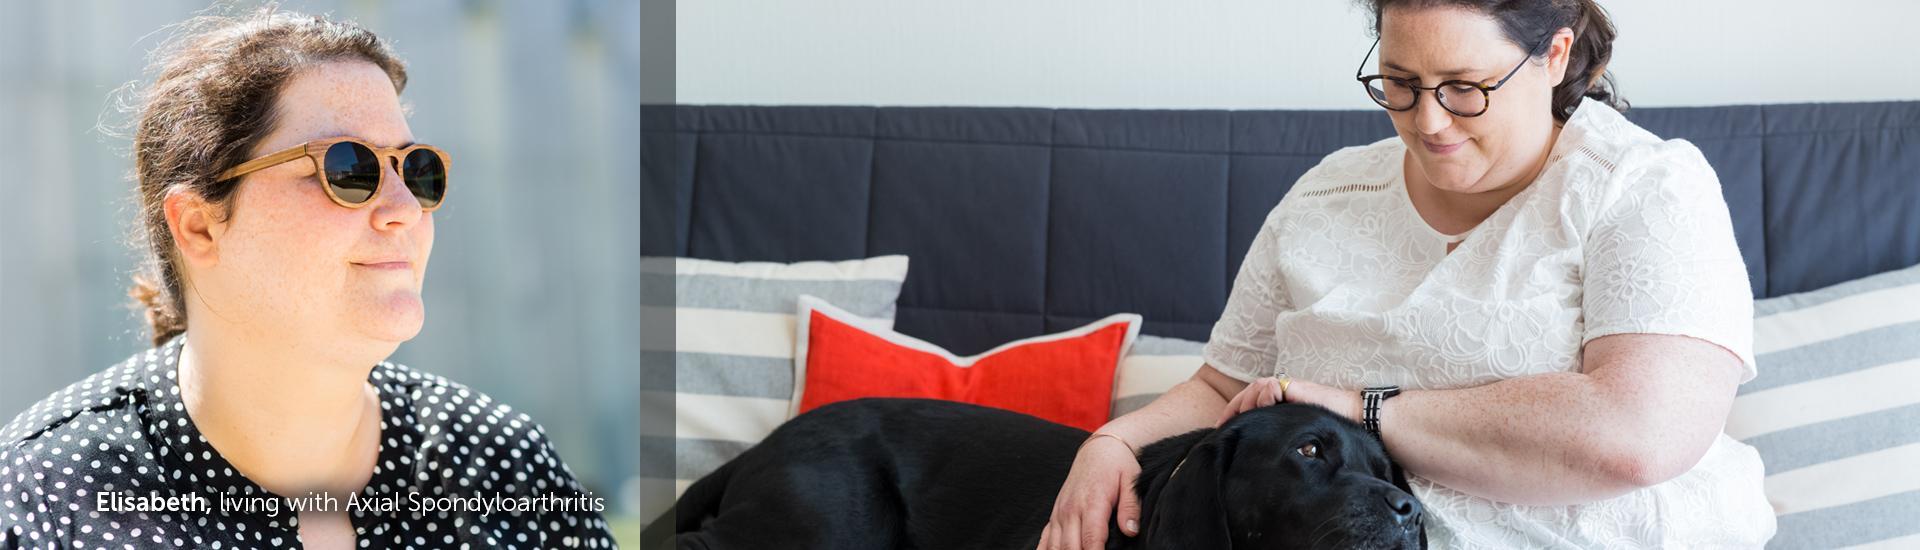 Elisabeth_living_with_Axial_Spondyloarthritis